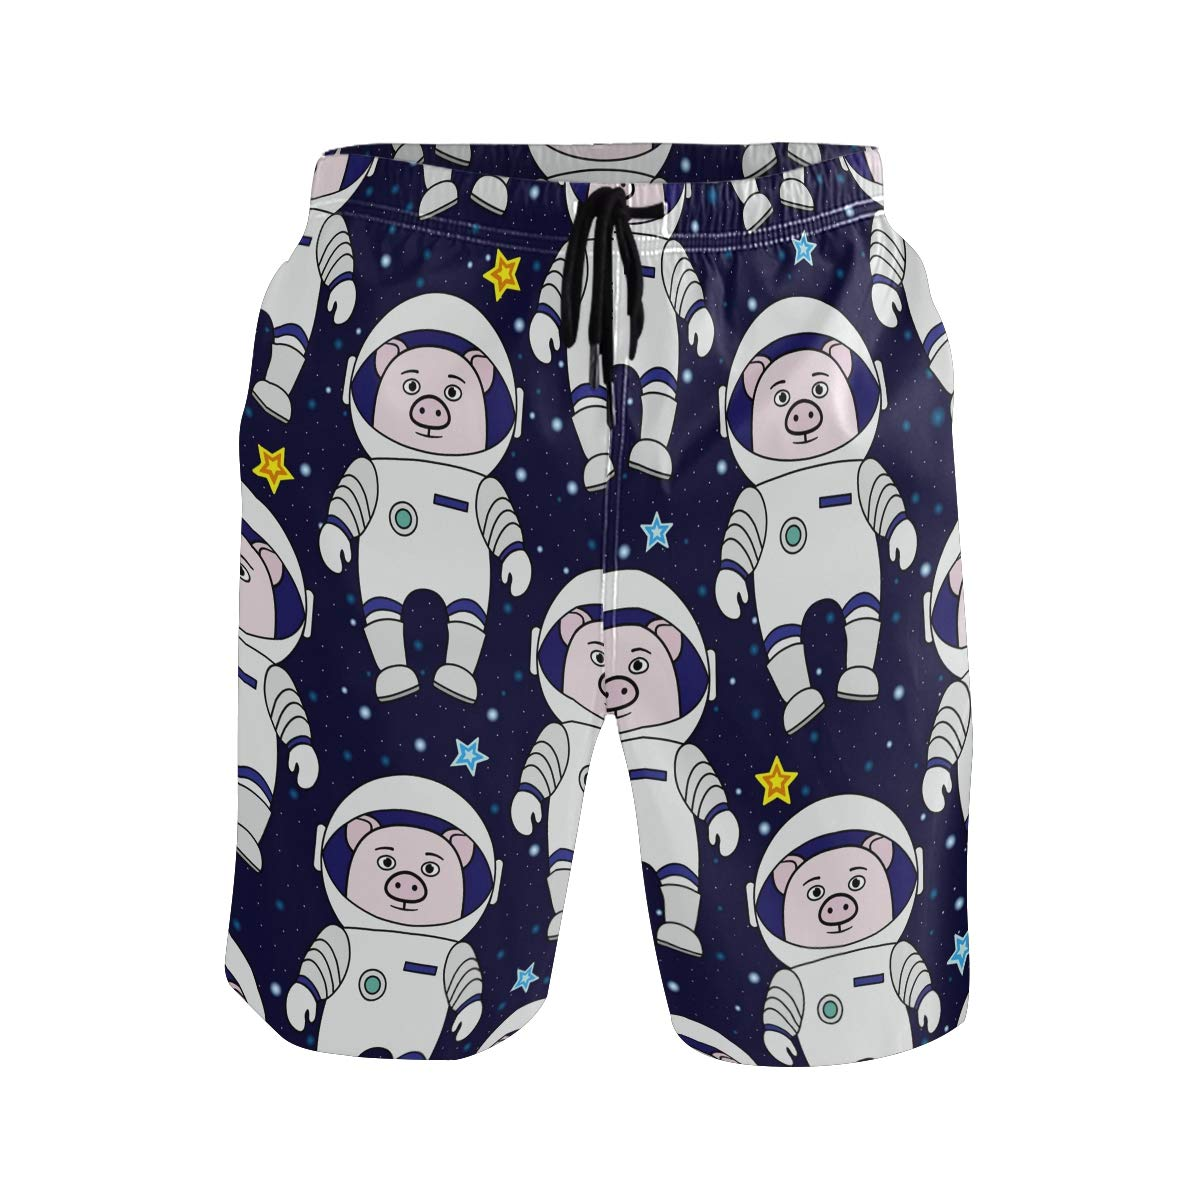 Mens Swim Trunks Pink Pig Astronaut Space Star Night Beach Board Shorts